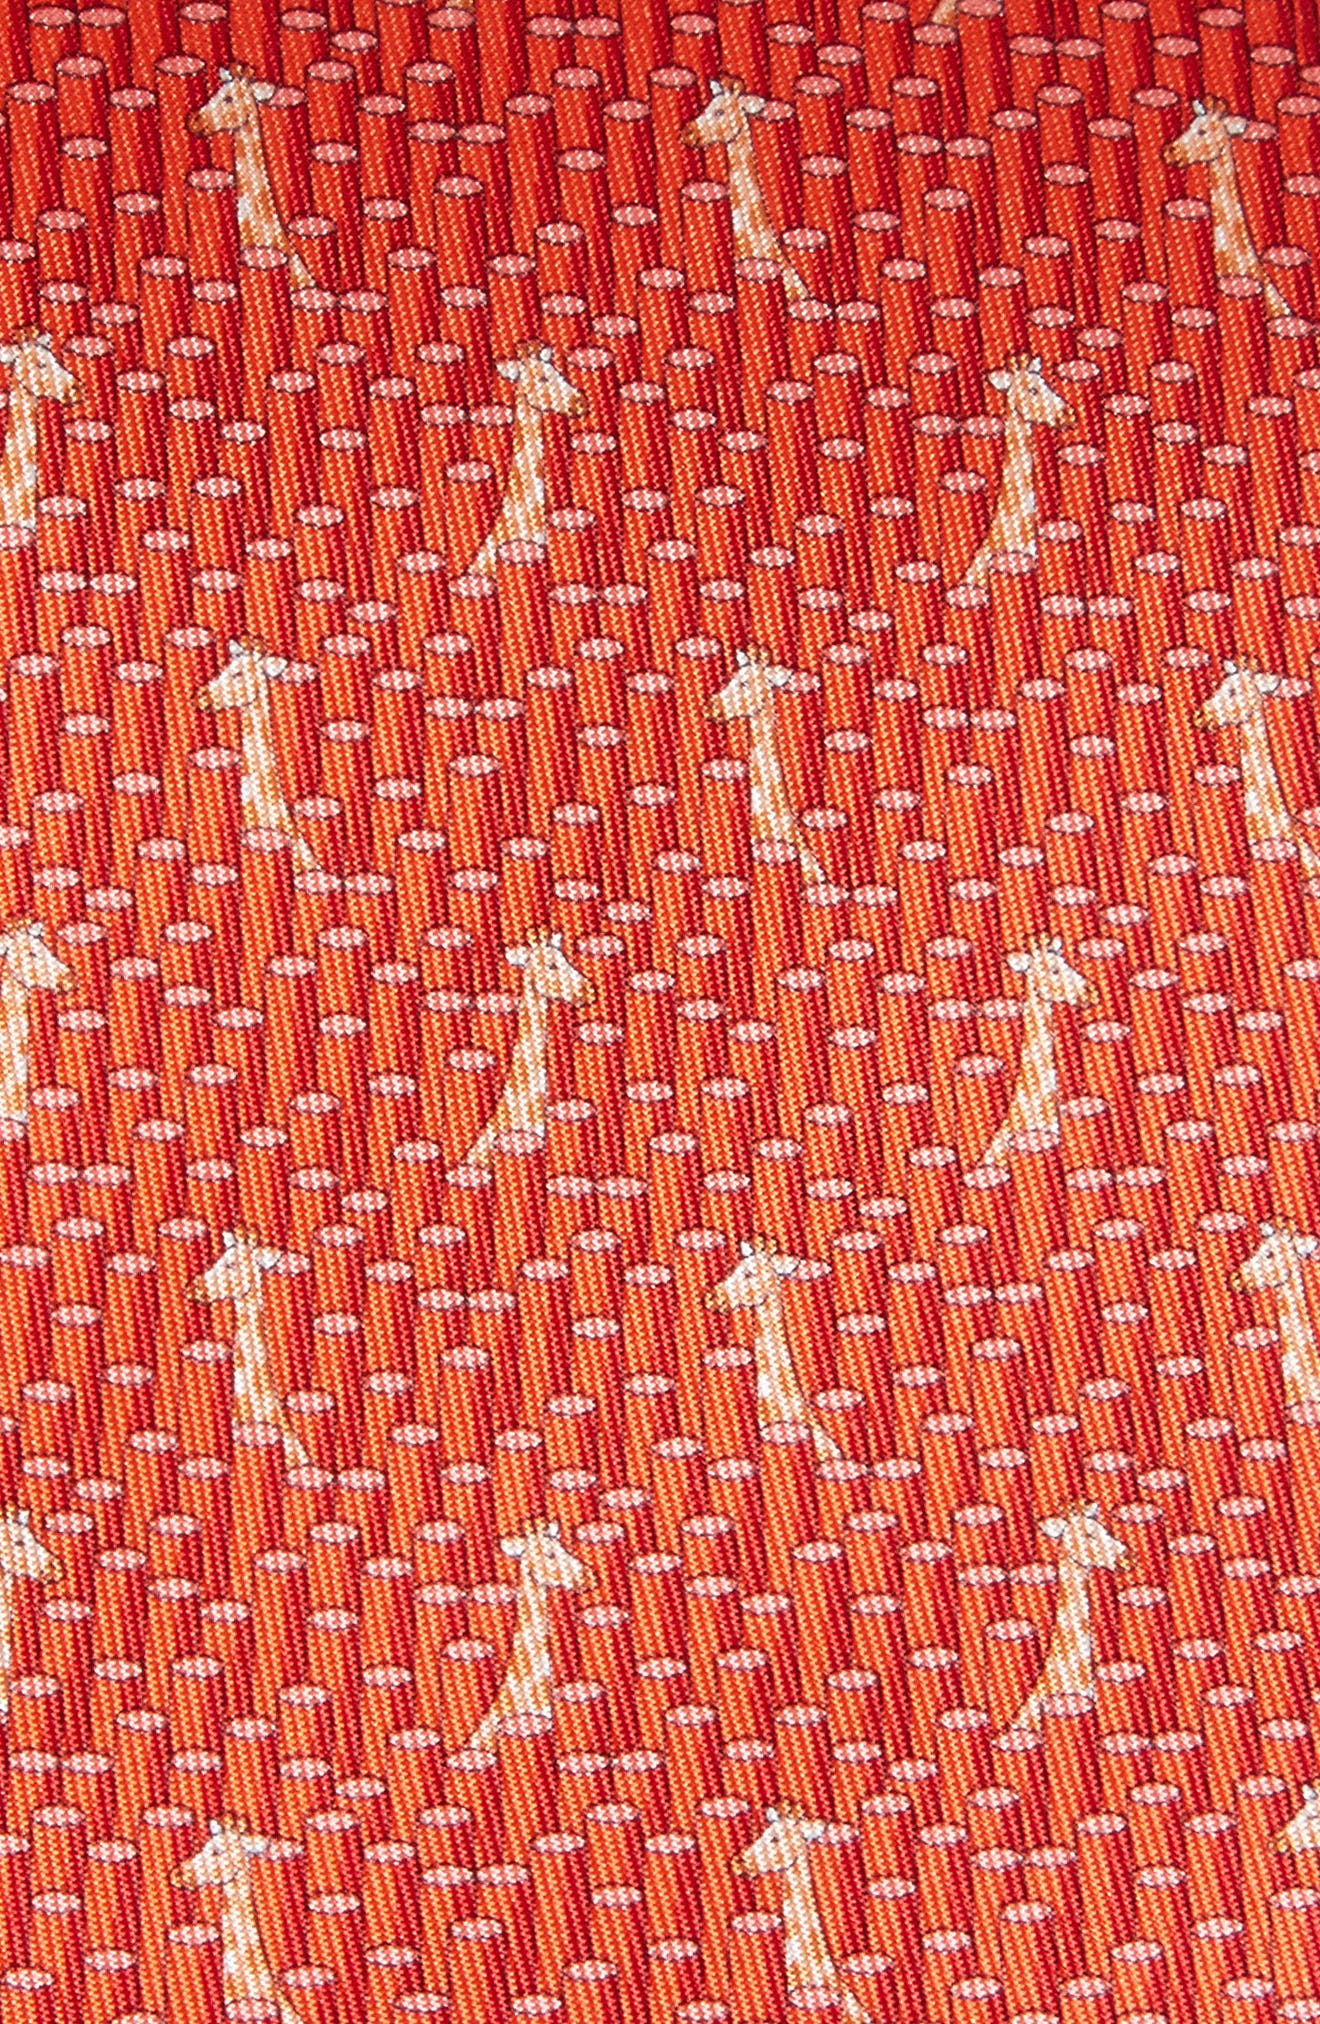 Giraffe Print Silk Tie,                             Alternate thumbnail 2, color,                             Red